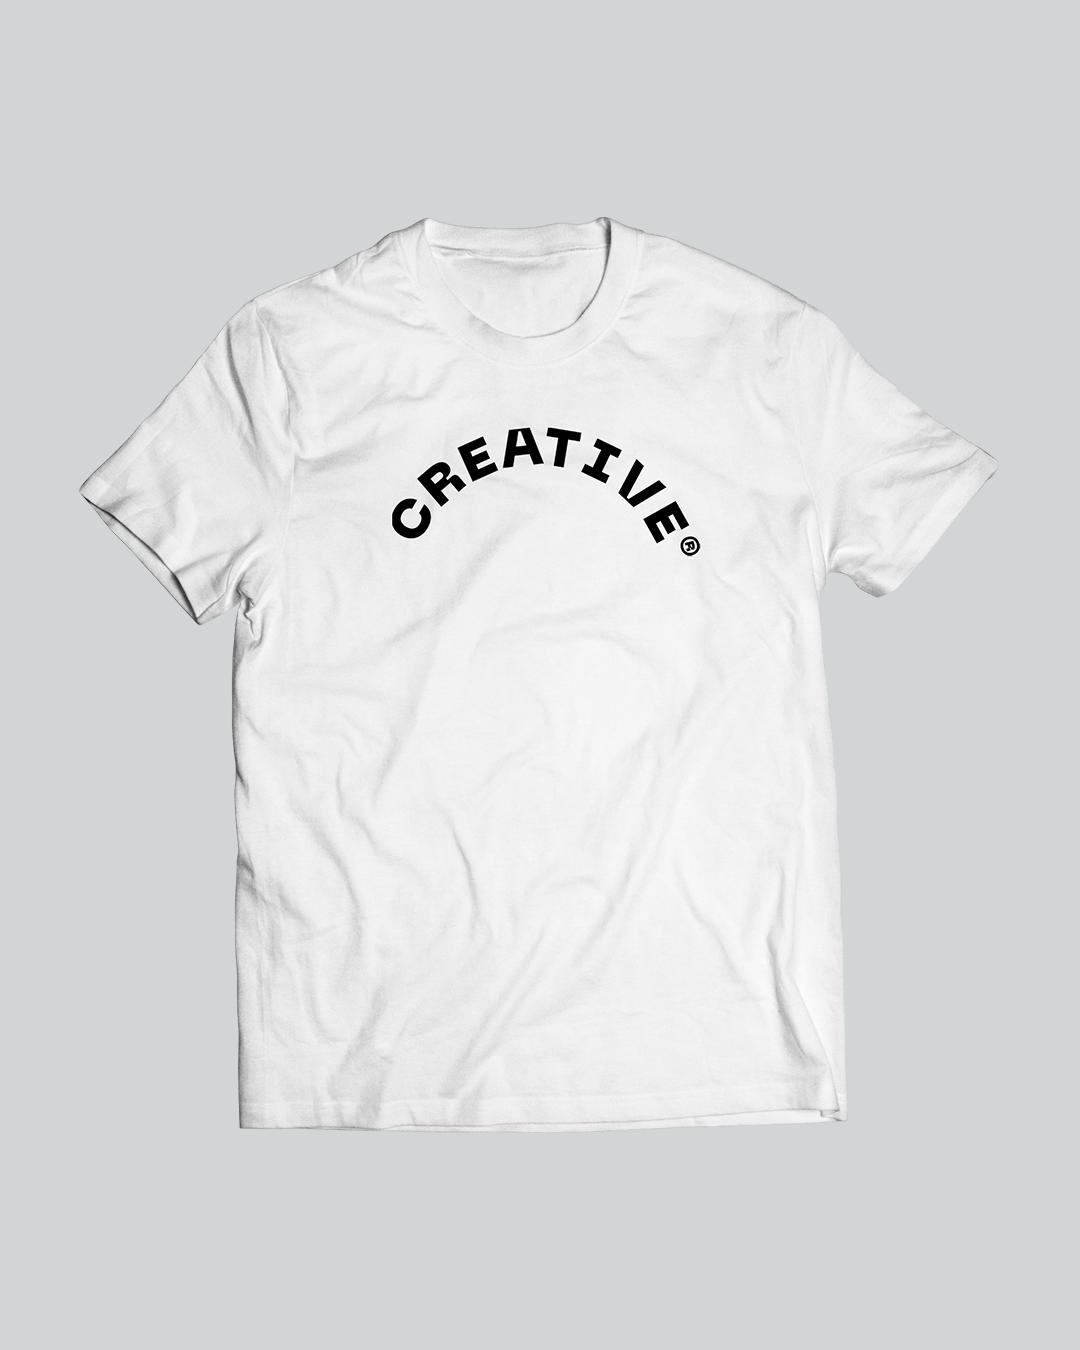 CREATIVE®